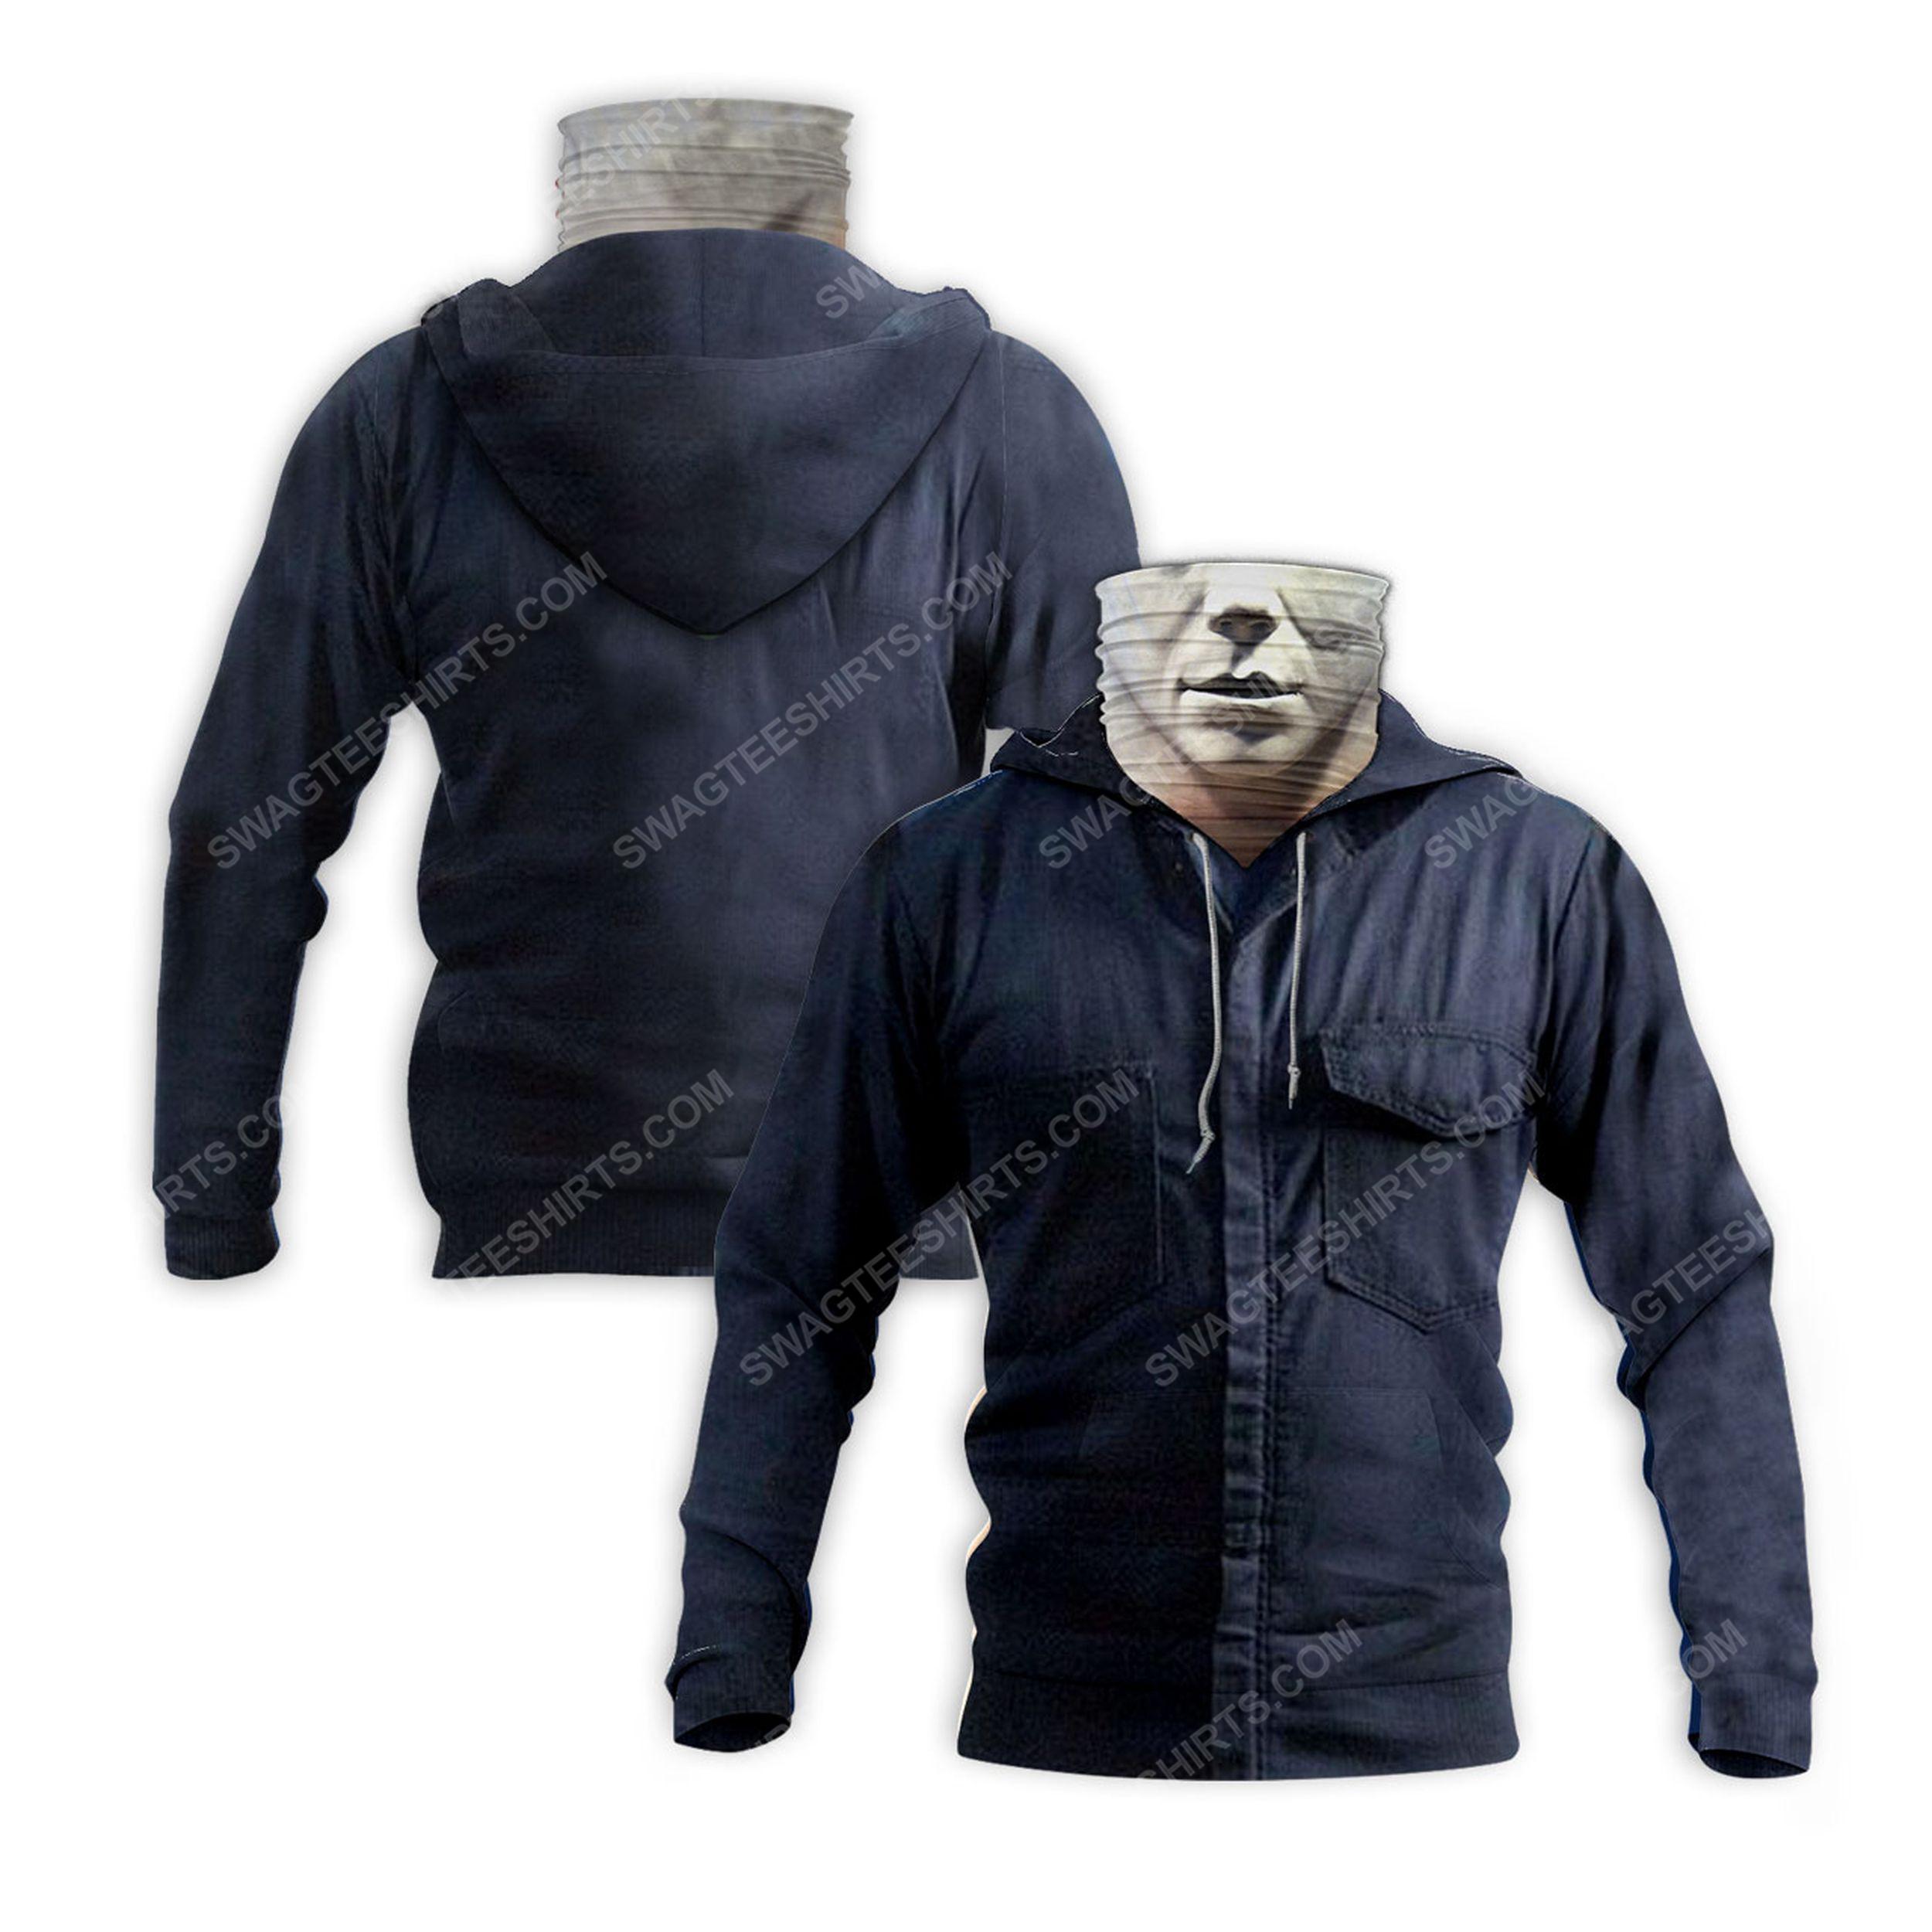 Horror movie michael myers for halloween full print mask hoodie 2(1)